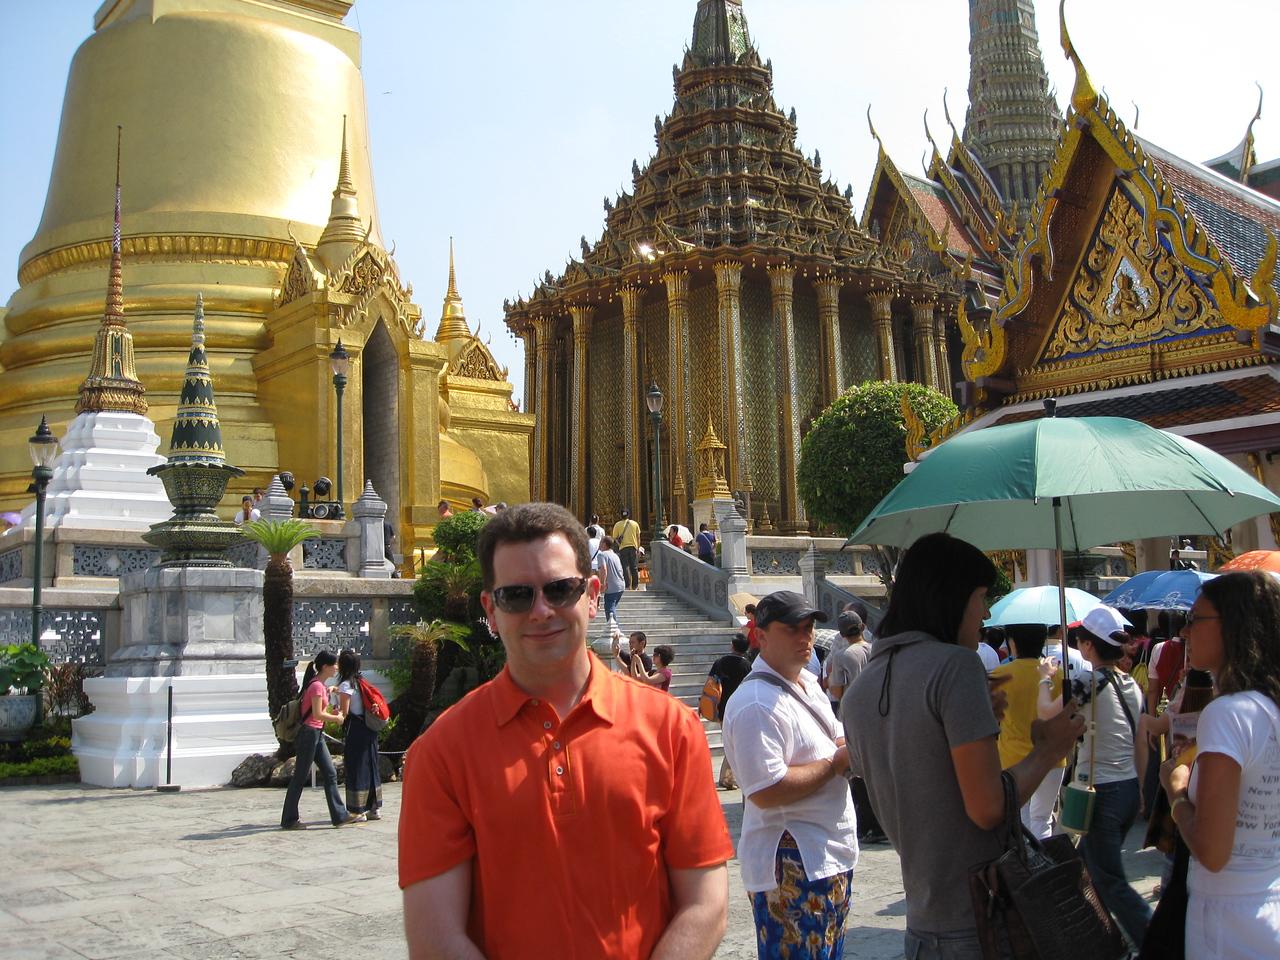 Phra Sri Rattana Chedi  (stupa) & Phra Mondop, the library